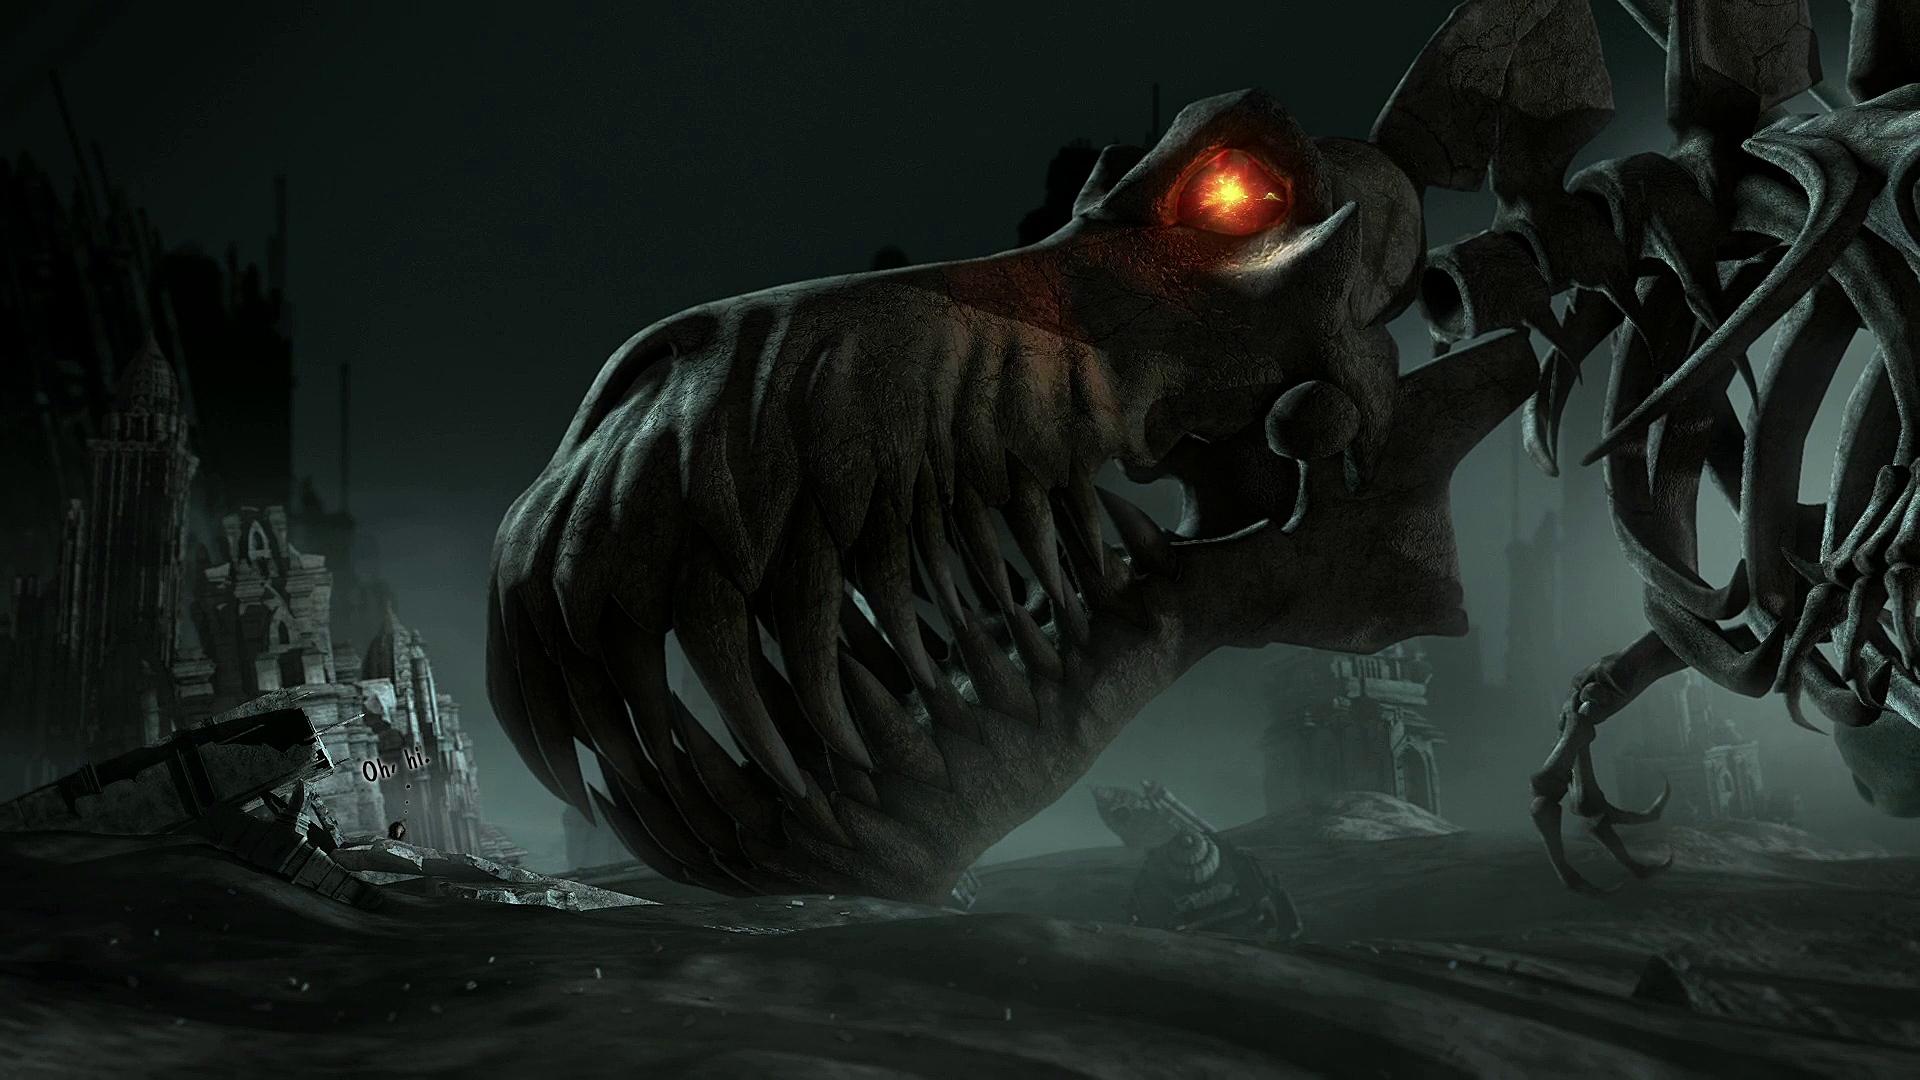 Chasseurs de dragons Fond d'écran HD | Arrière-Plan | 1920x1080 | ID:126566 - Wallpaper Abyss